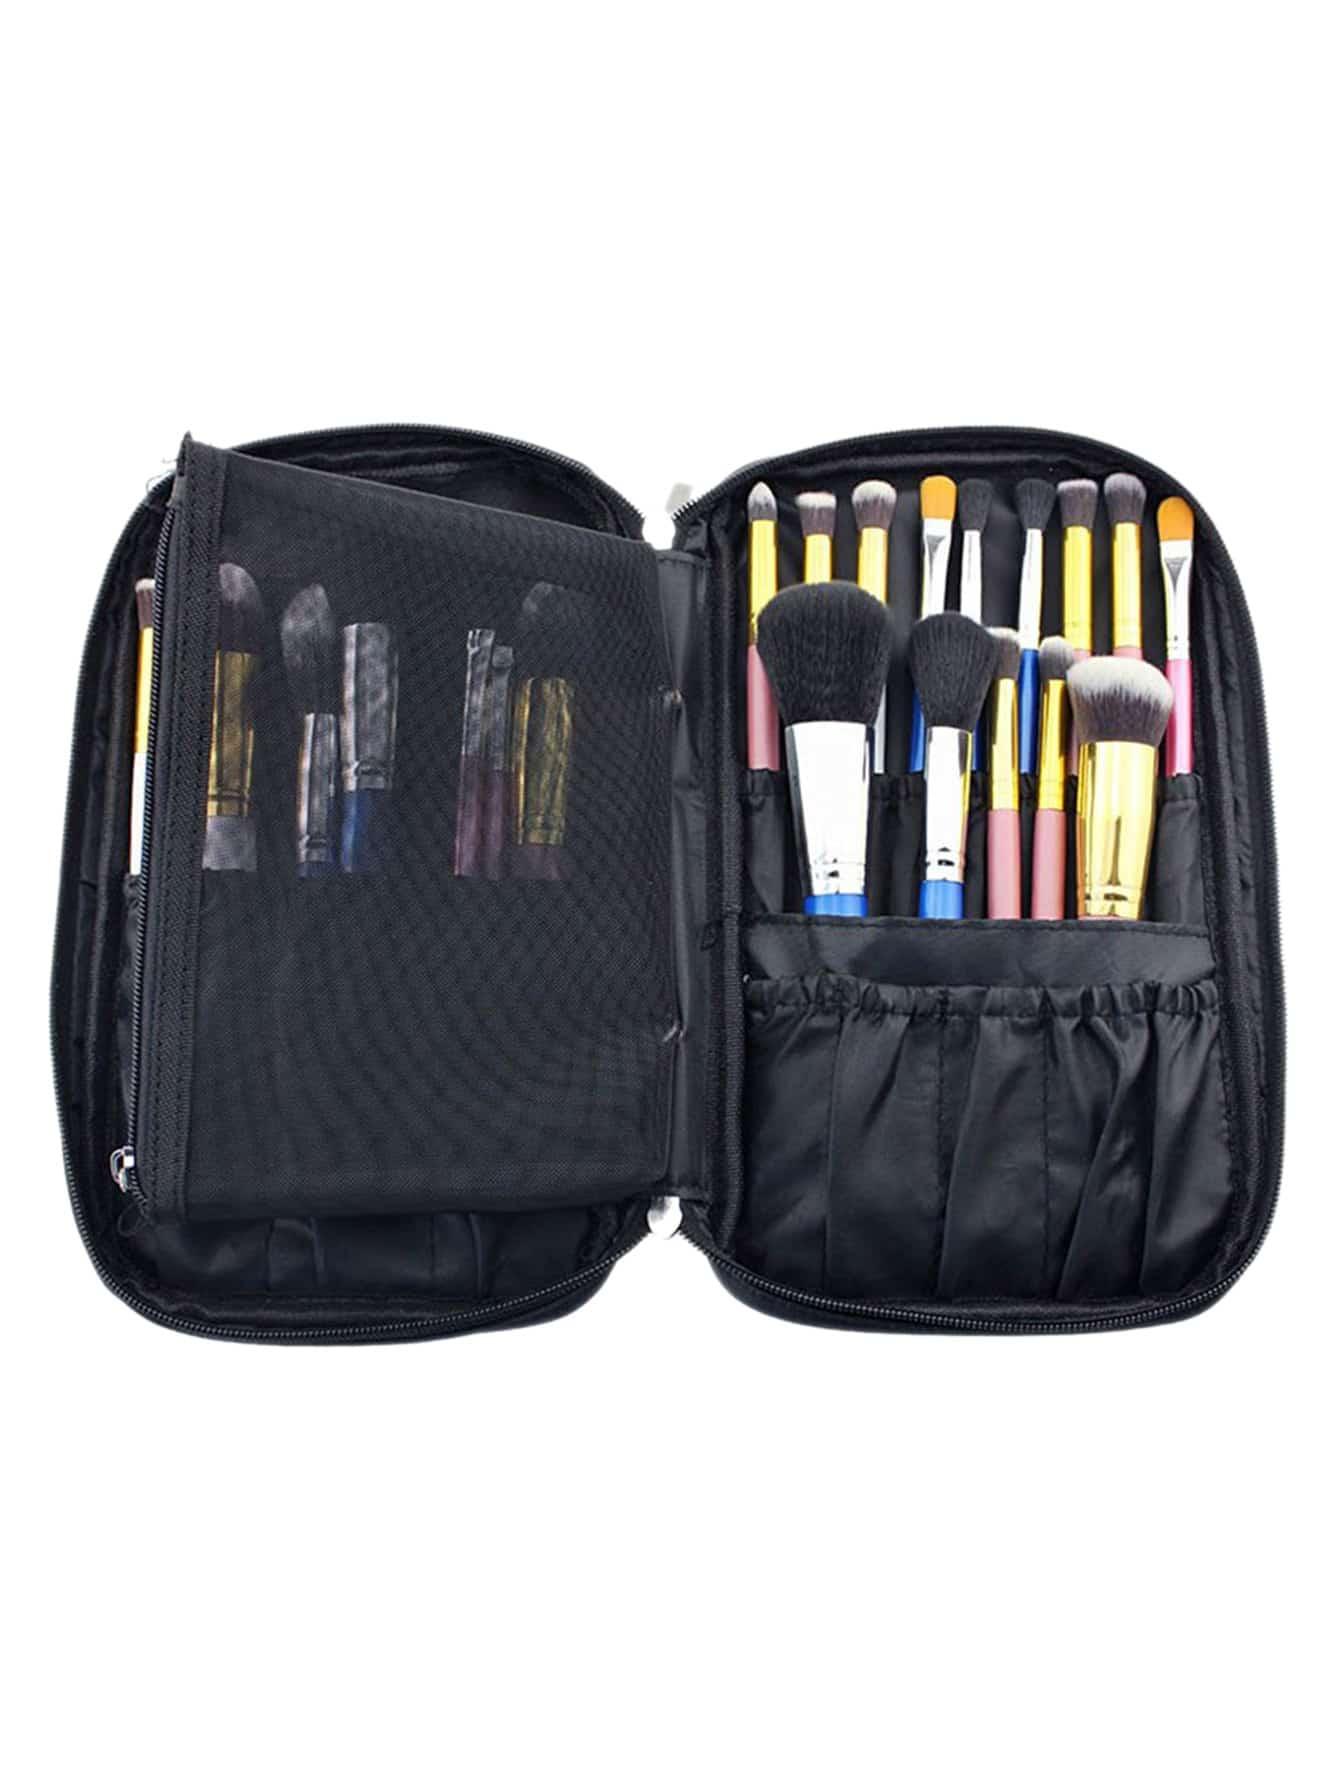 Фото Black Zipper Makeup Bag With Small Mesh Bag. Купить с доставкой